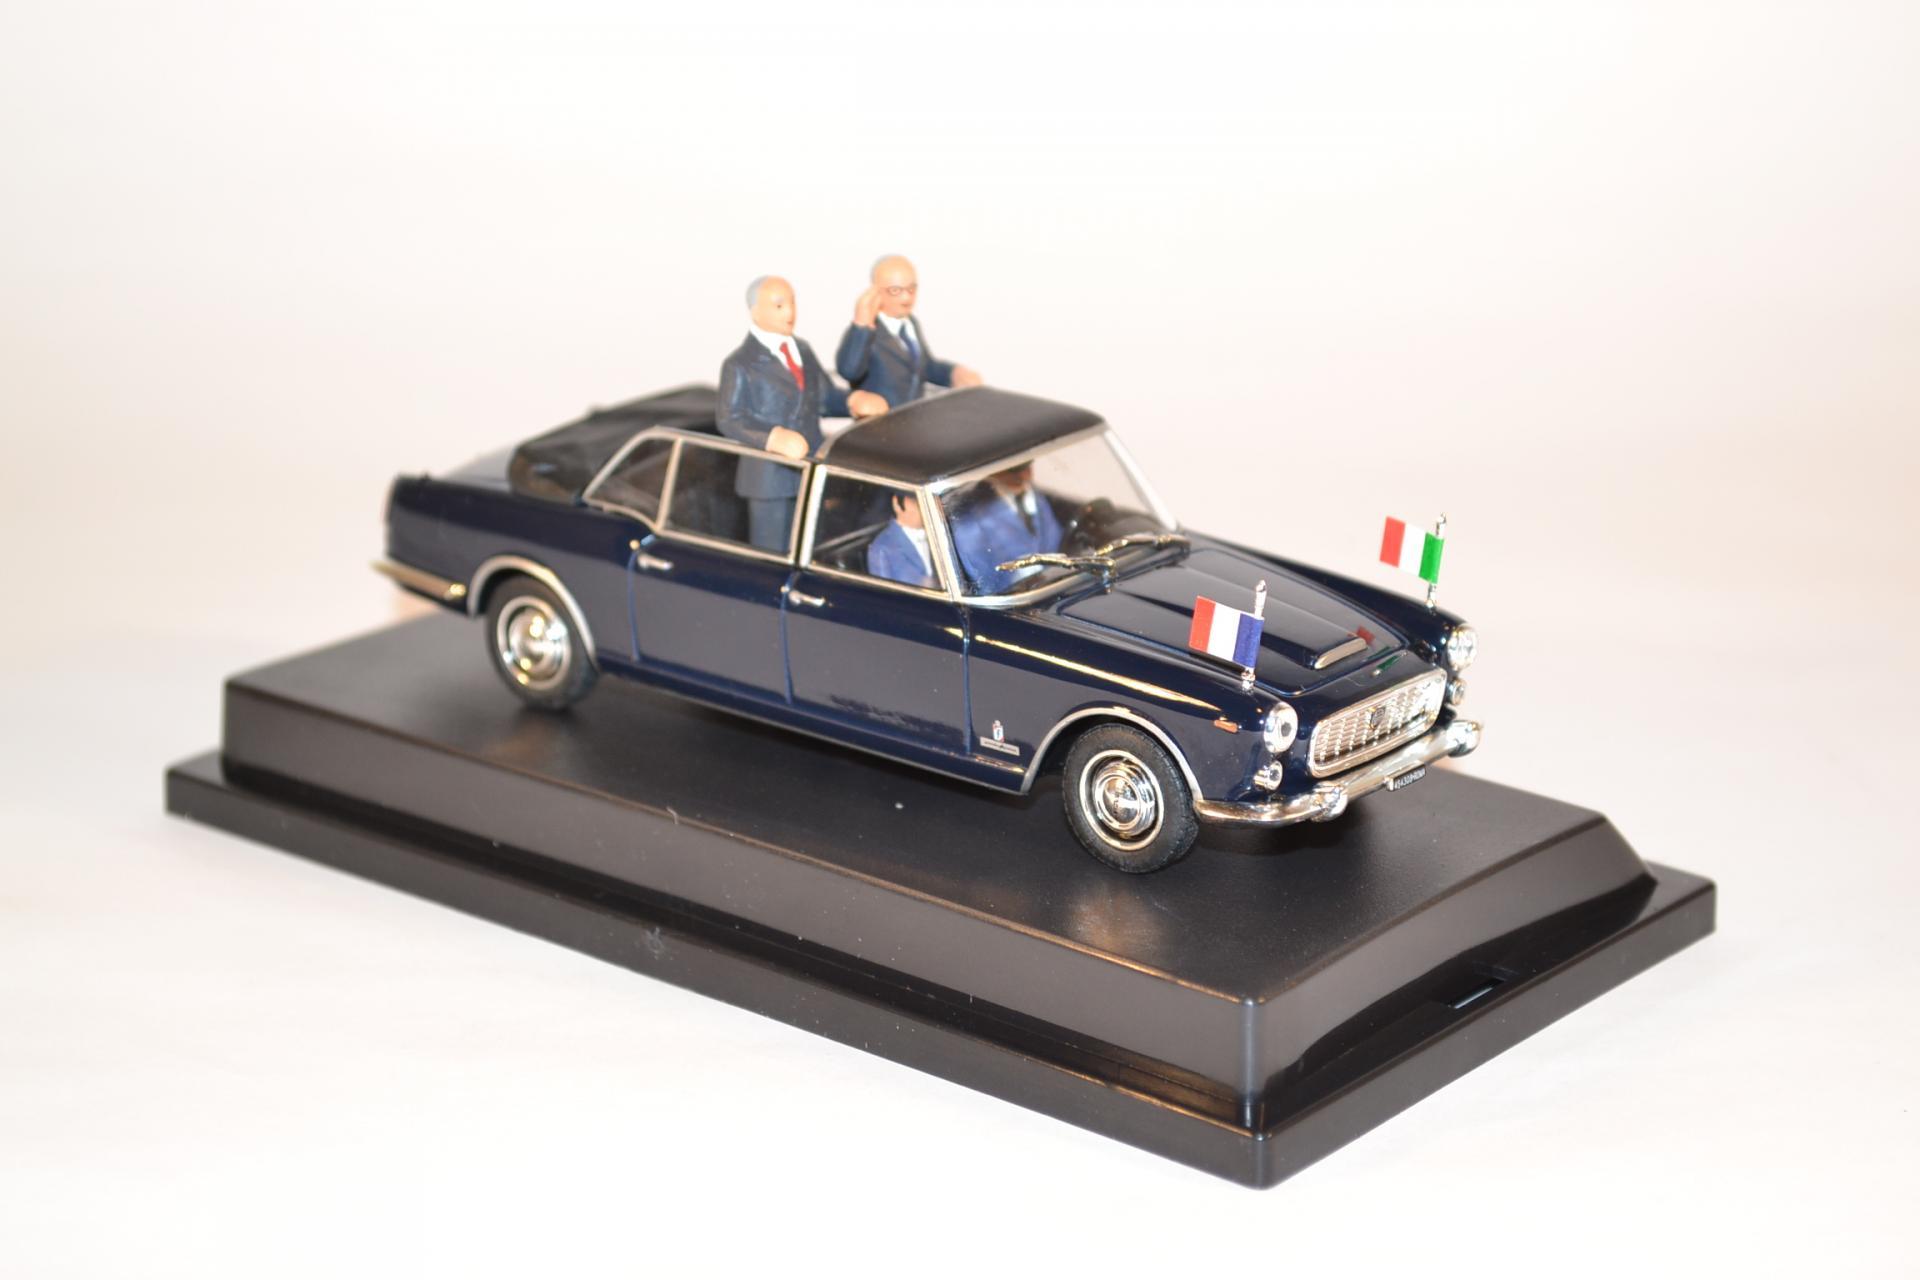 Starline lancia flaminia presidenziale saragat de gaulle mont blanc 1965 autominiature01 2